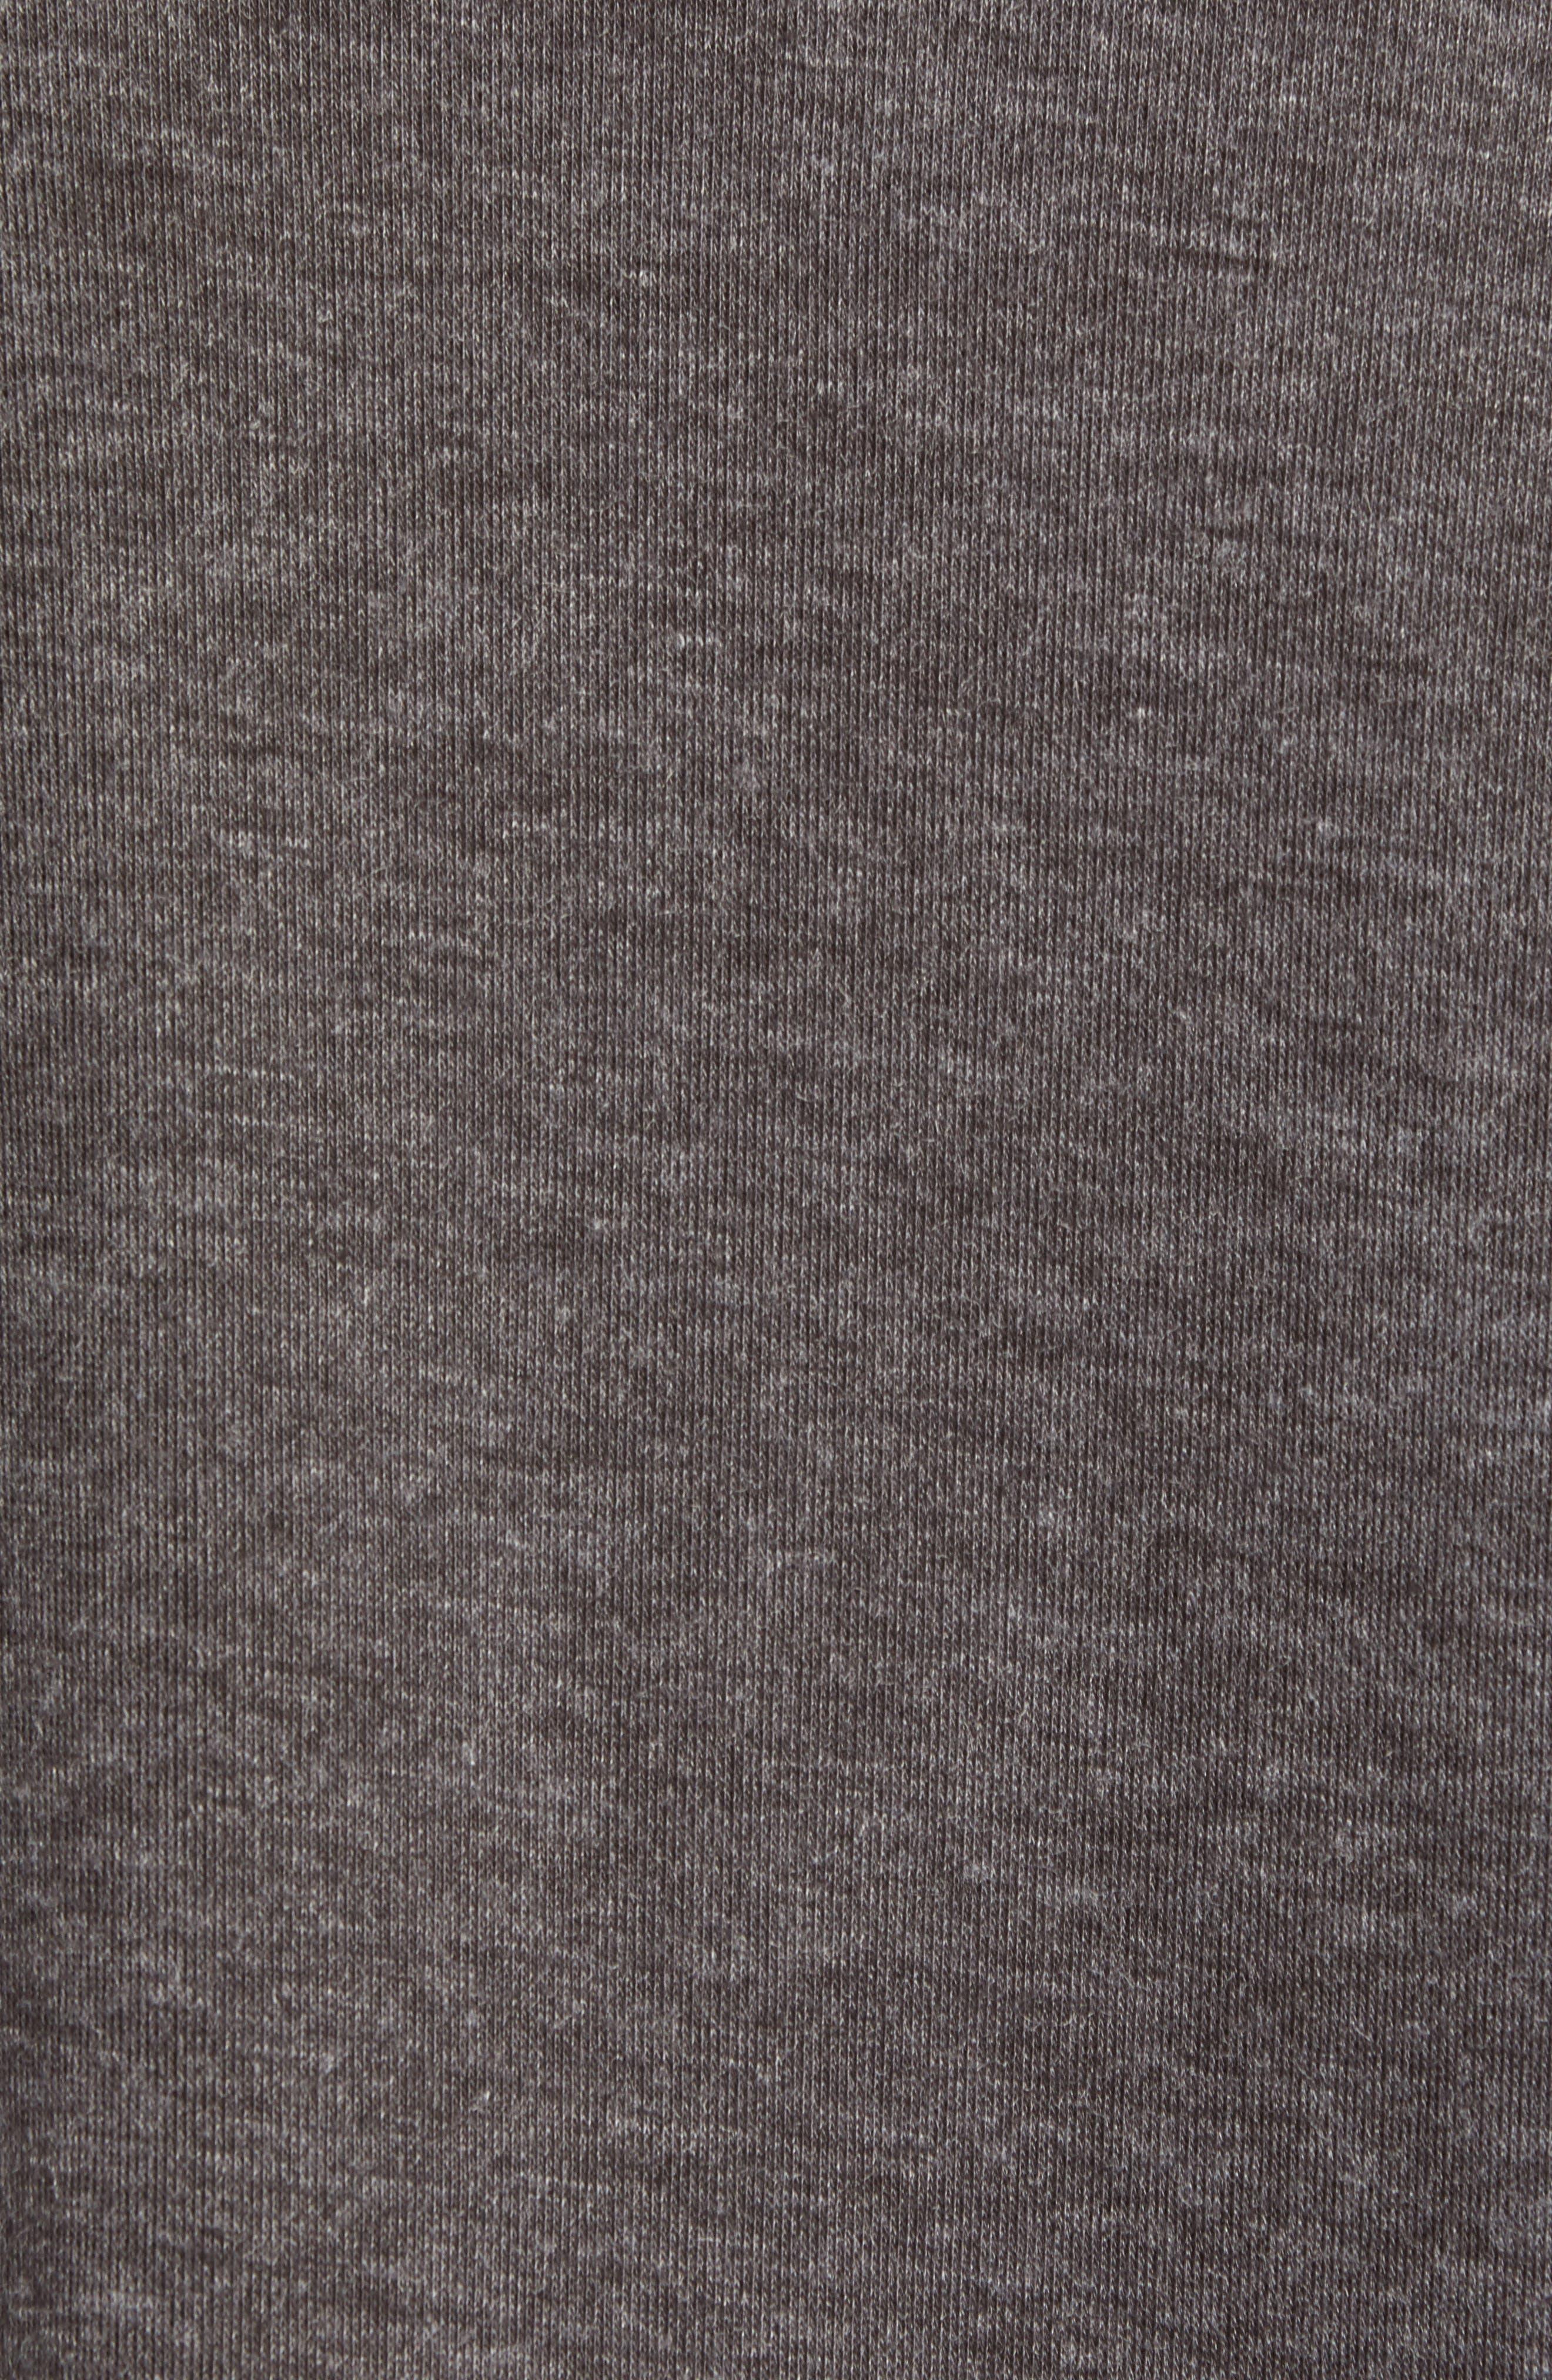 Prospect V-Neck Performance Sweater,                             Alternate thumbnail 5, color,                             CHARCOAL